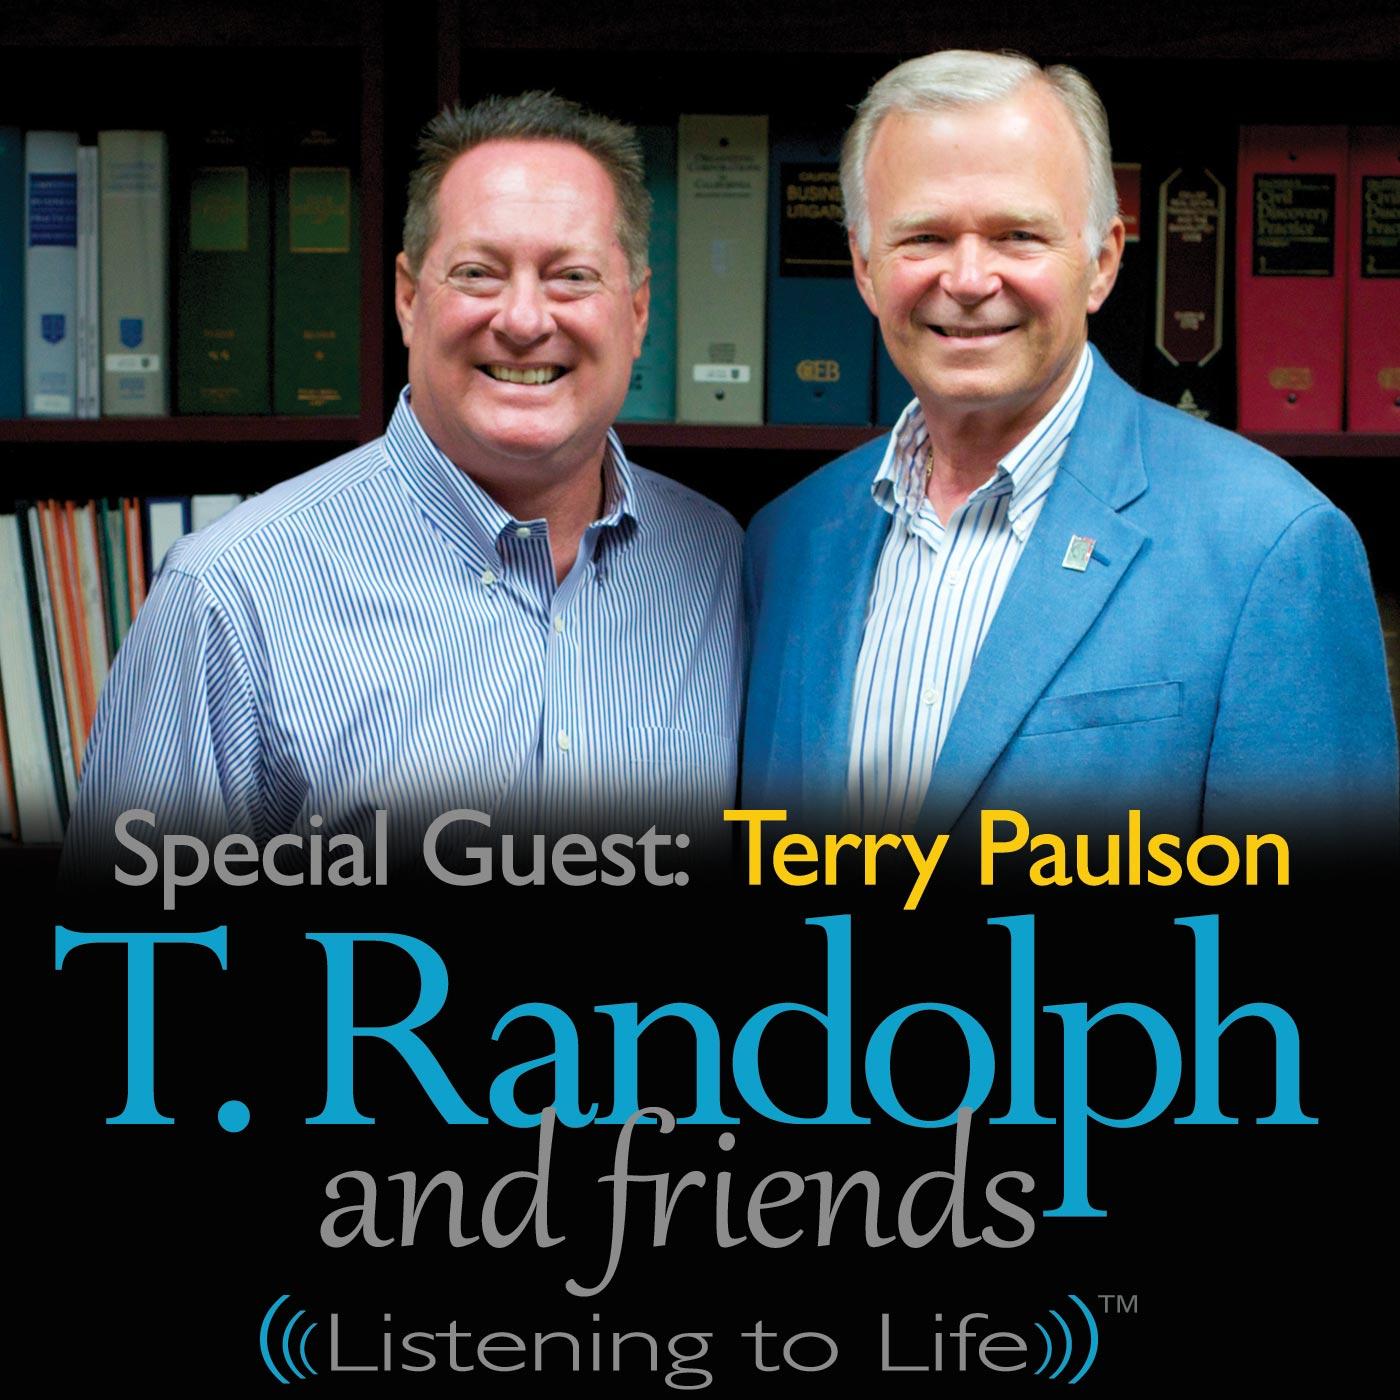 Trf007 terry paulson celebrating america t randolph for Randolph and associates